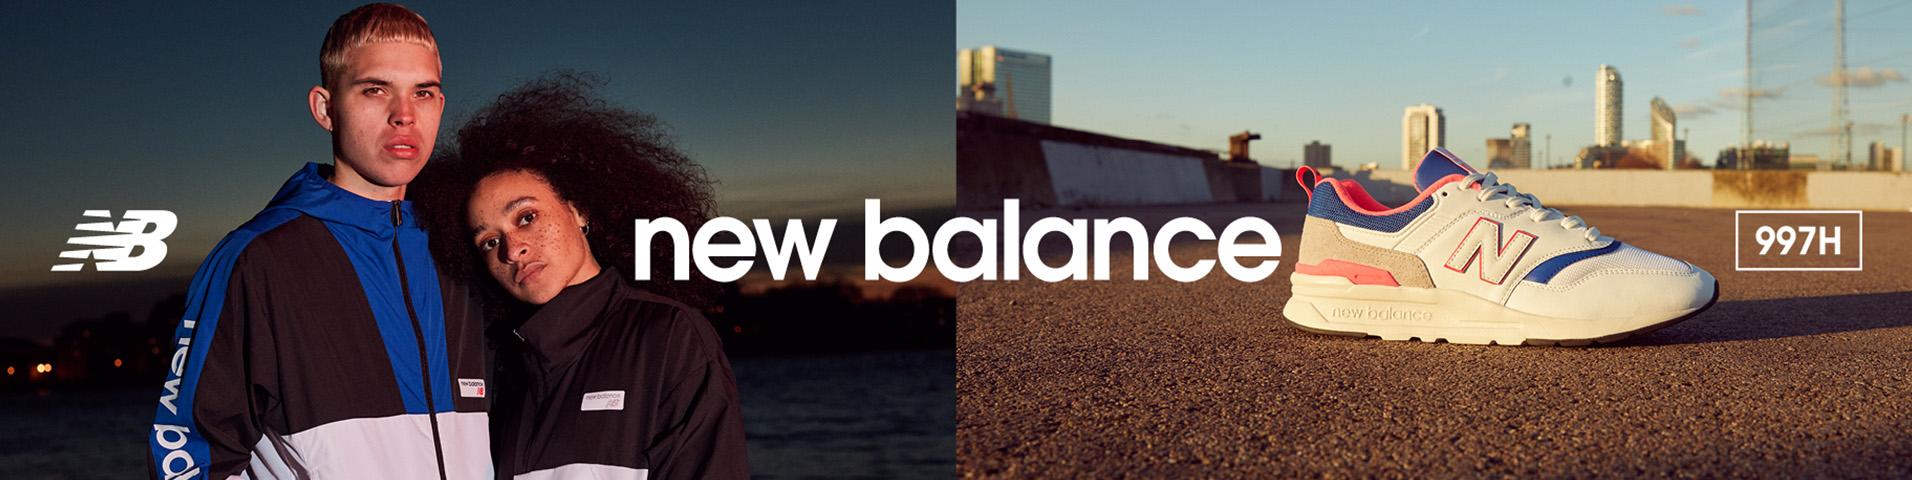 New Balance online shop | Gratis verzending | ZALANDO